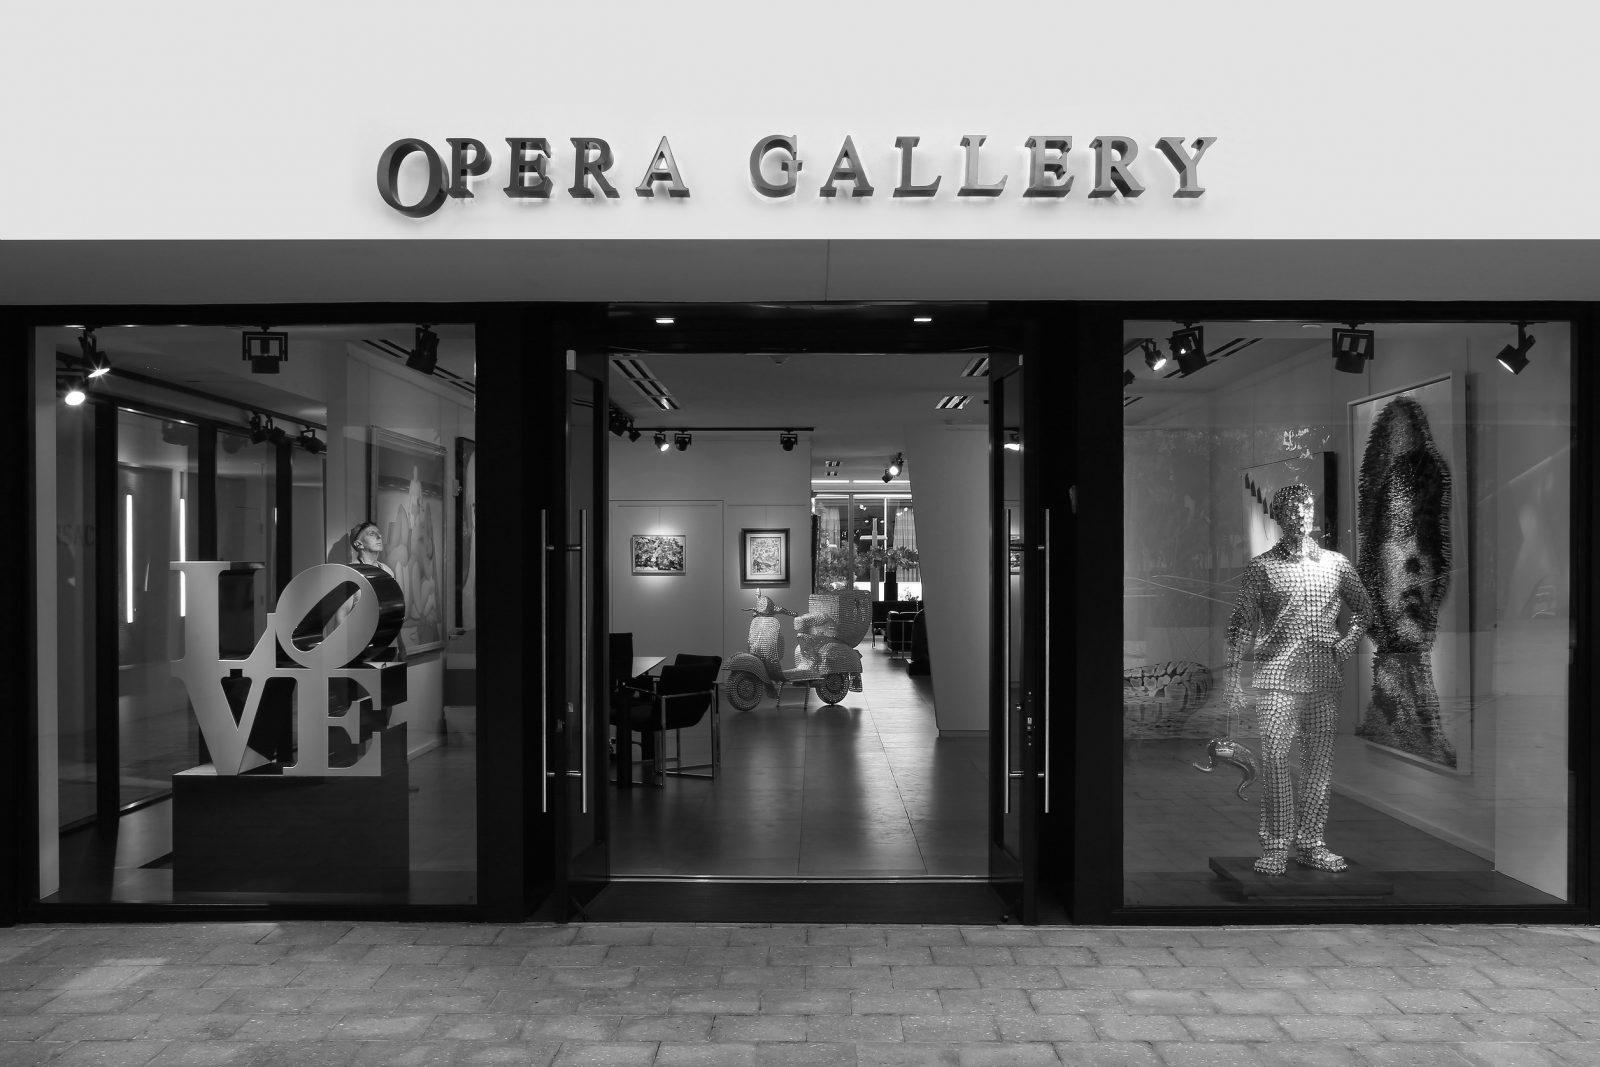 Opera-Galary-things-to-do-in-dubai